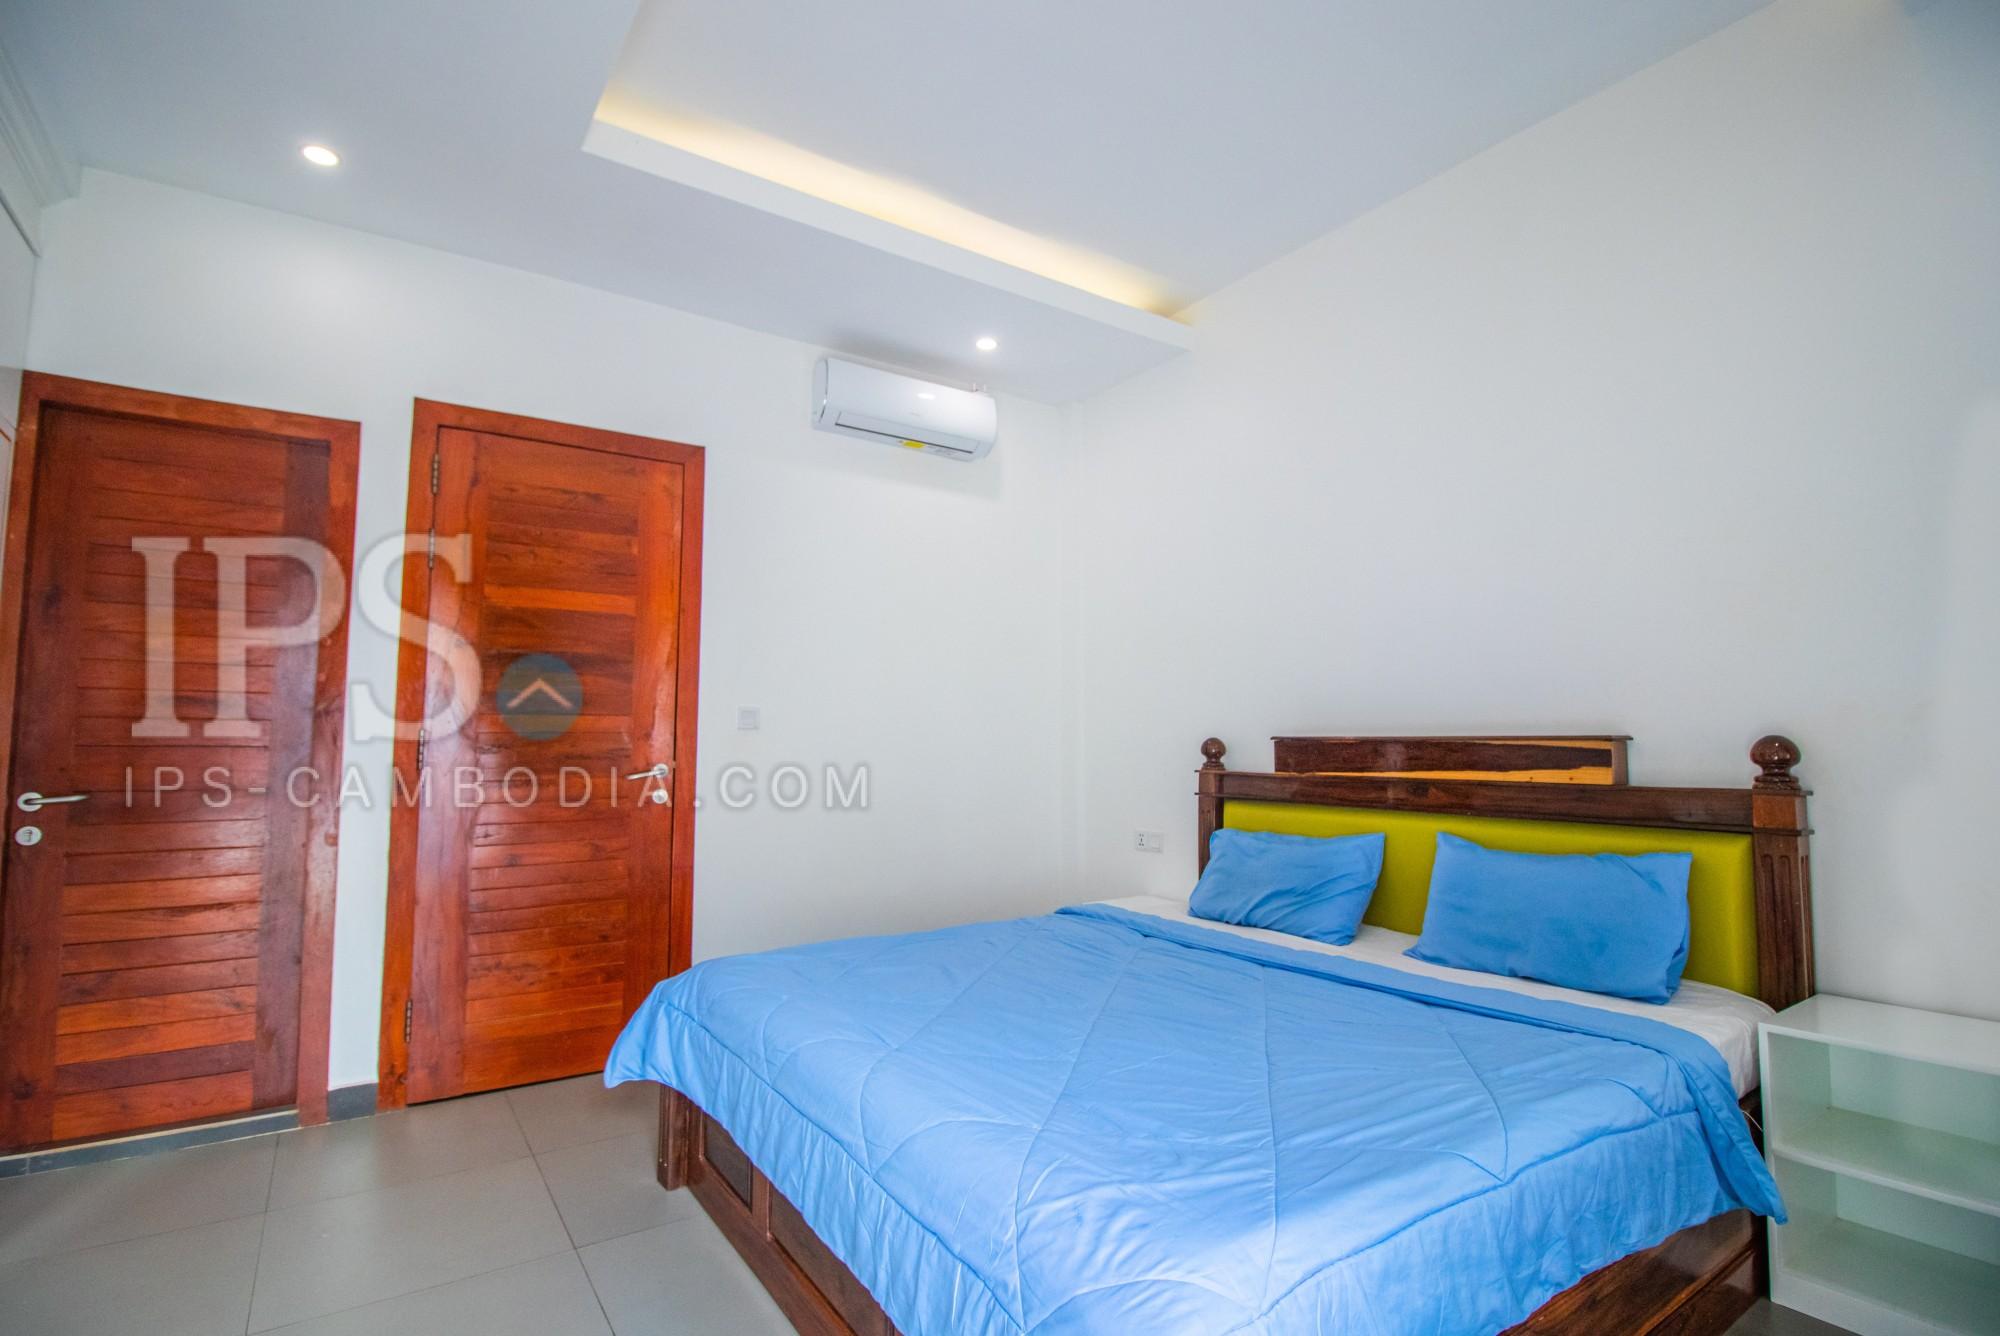 2 Bedroom Flat  For Rent - Sala Kamreuk, Siem Reap